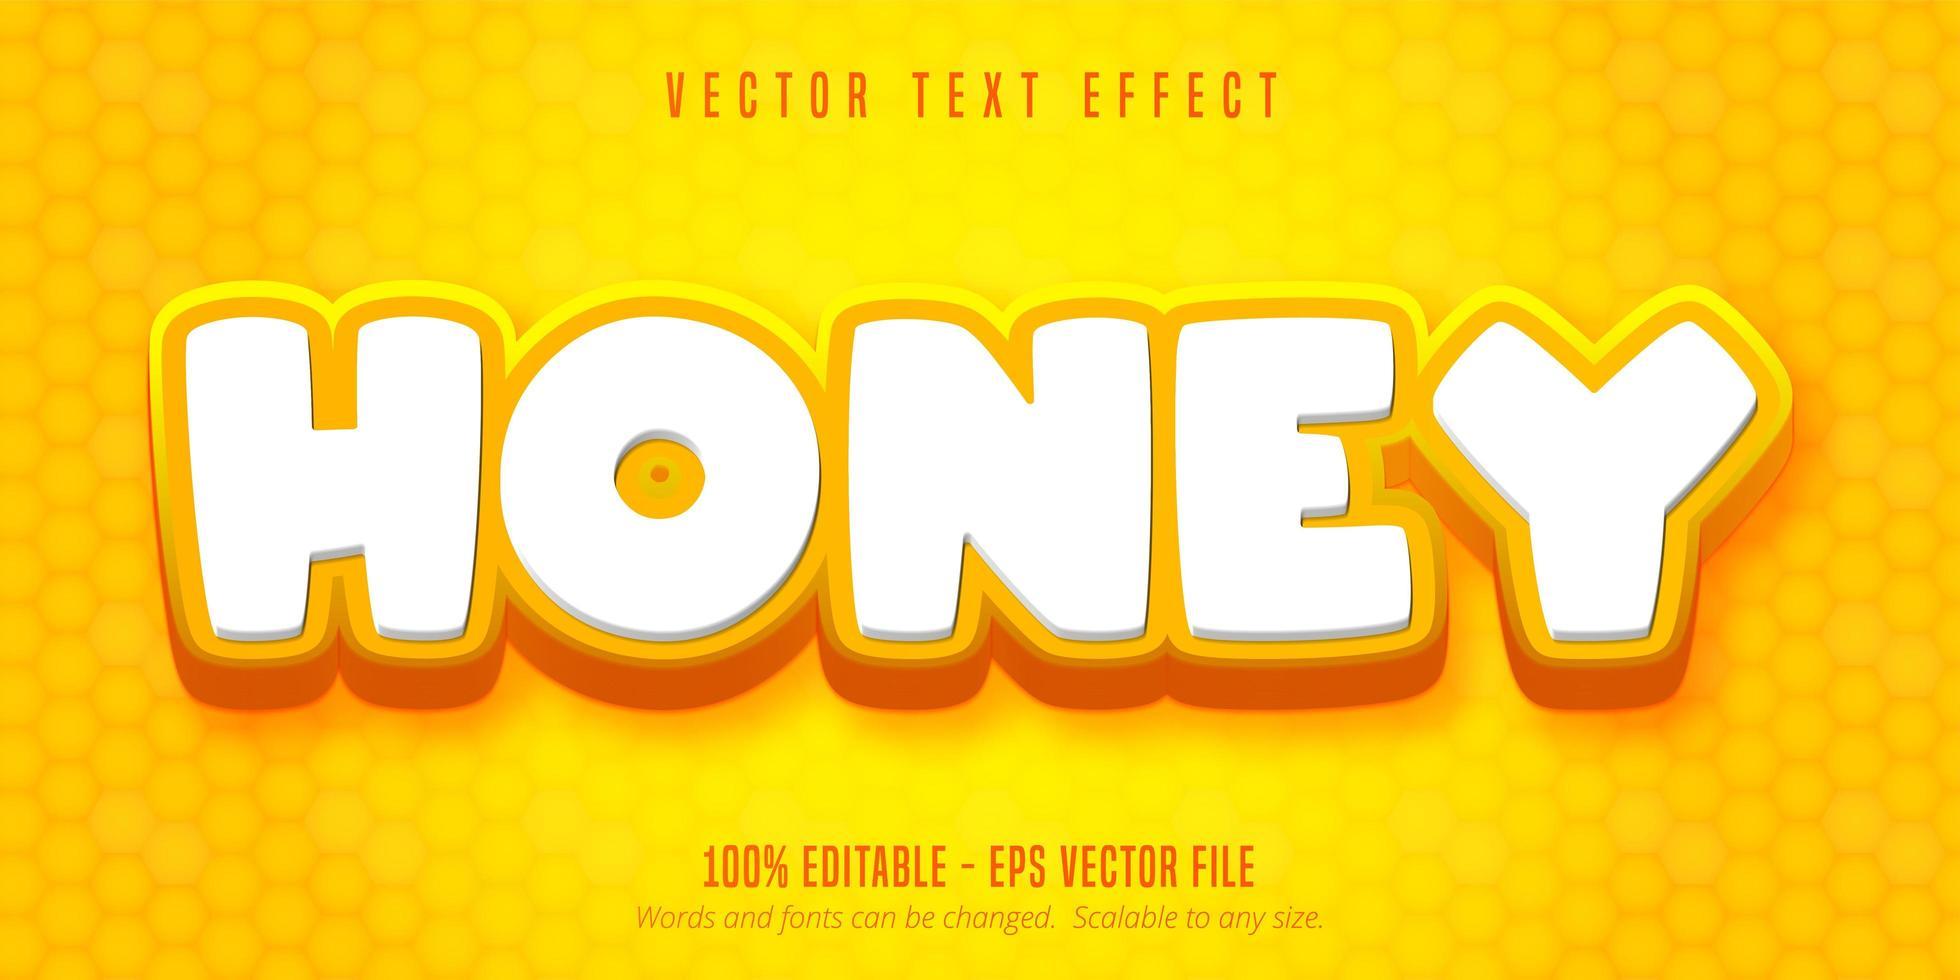 texto mel, efeito de texto estilo desenho animado vetor